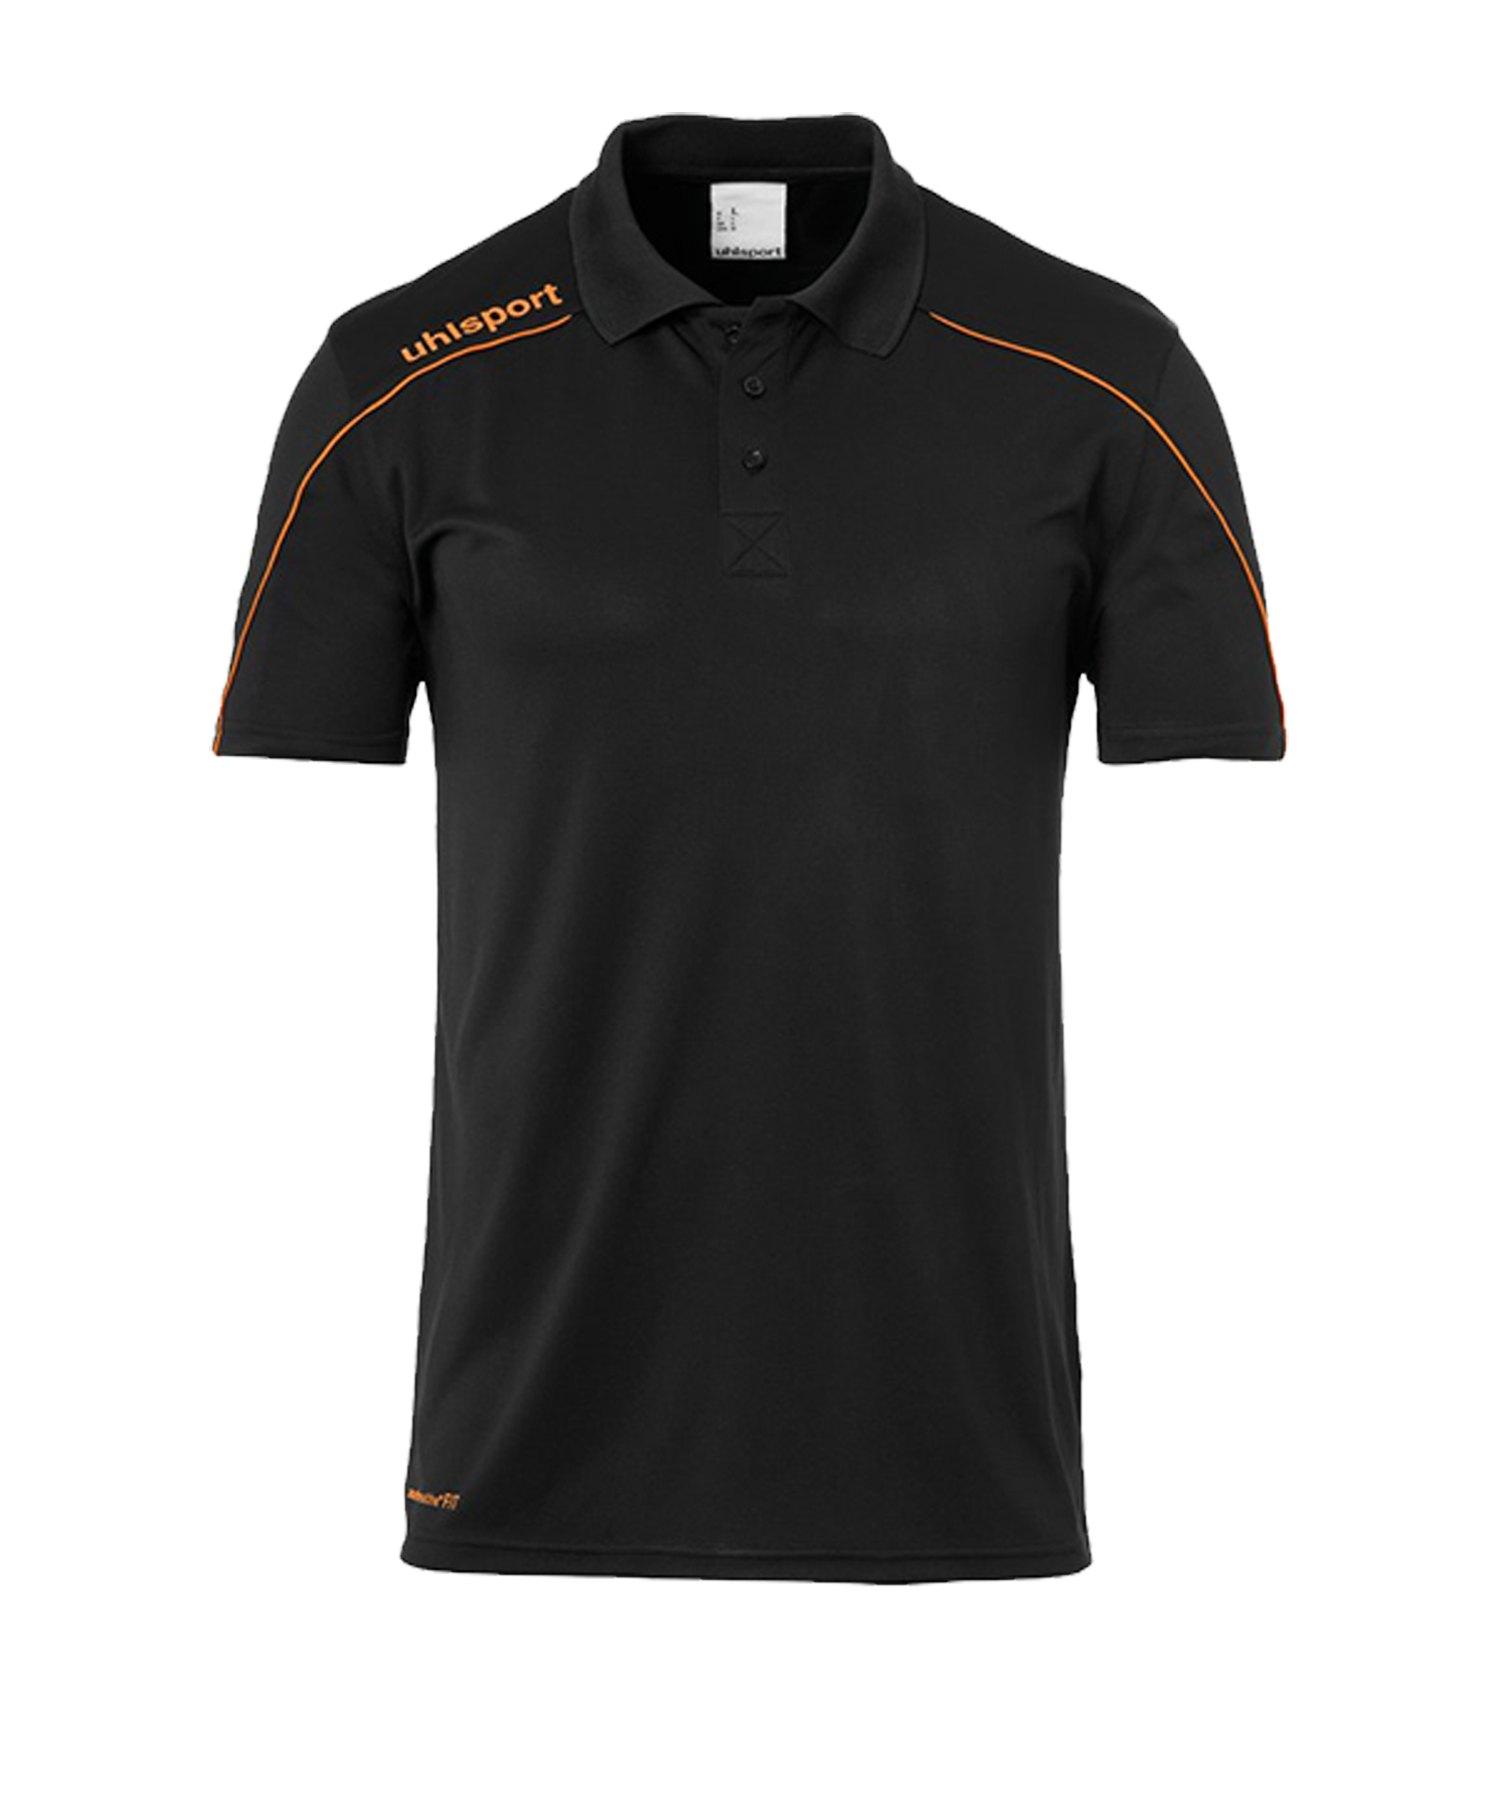 Uhlsport Stream 22 Poloshirt Schwarz Orange F22 - Schwarz